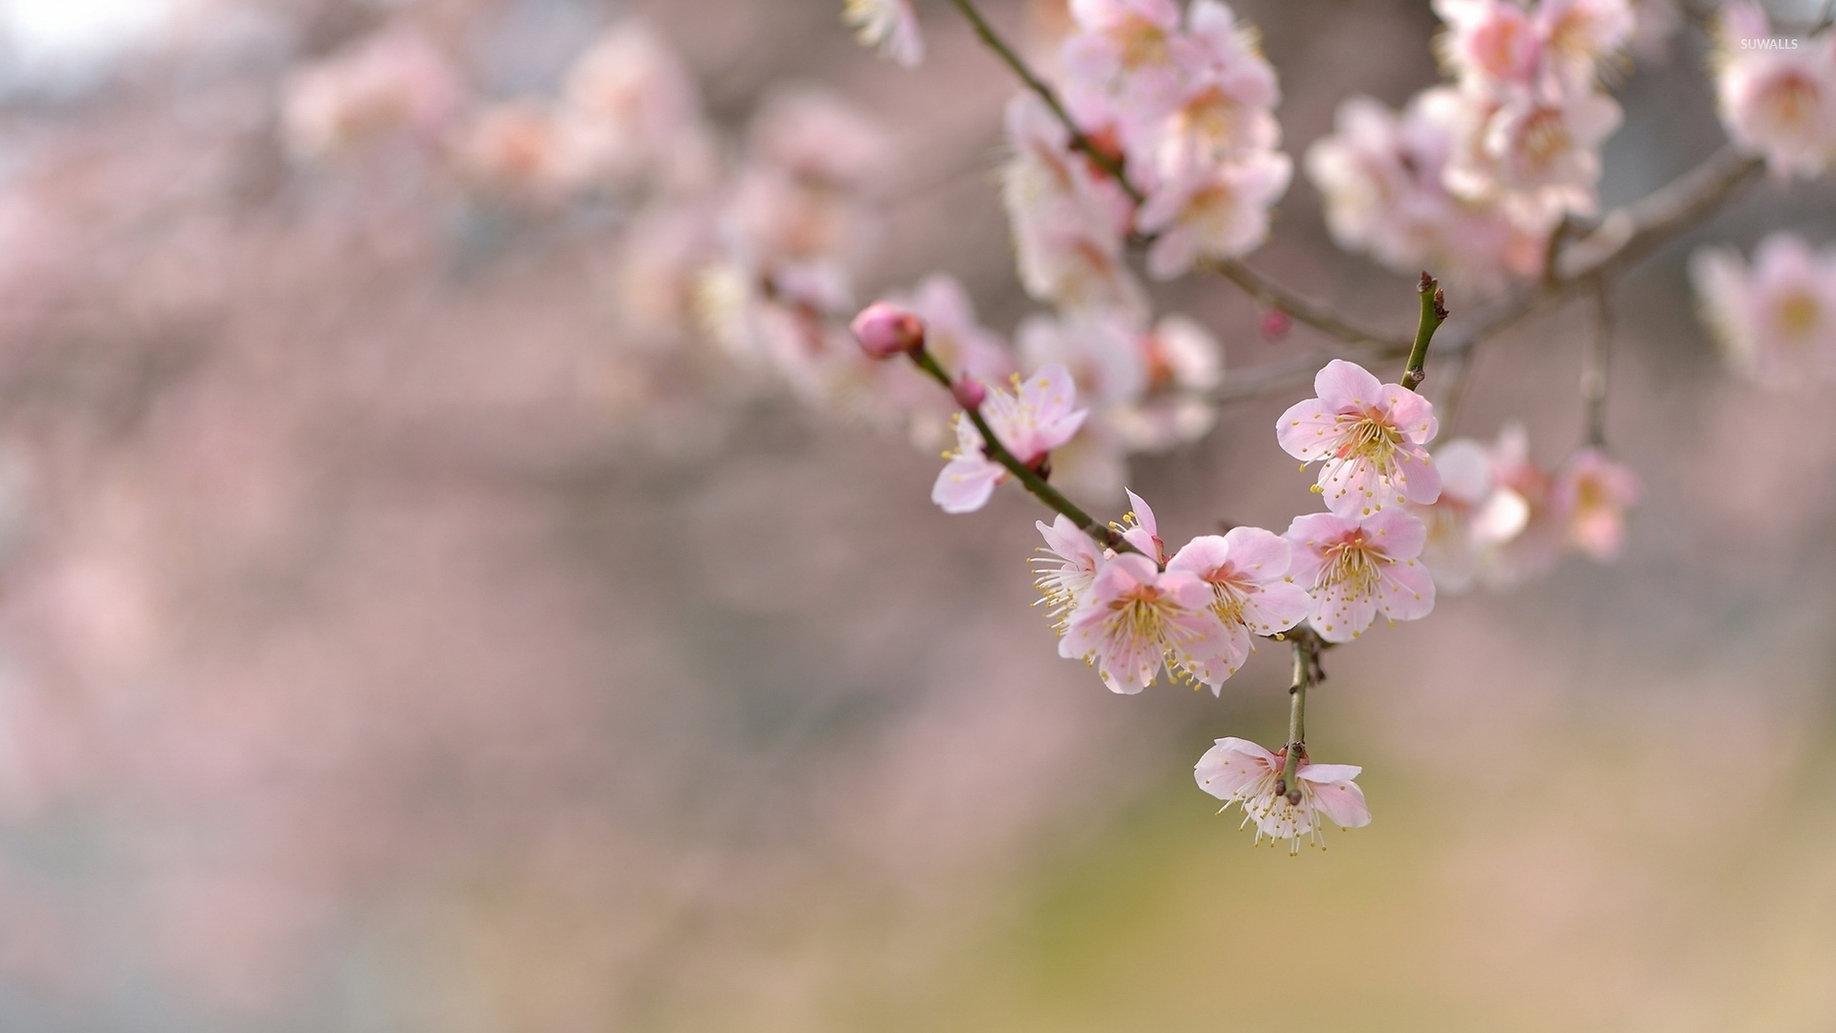 cherry-blossoms-35110-1920x1080.jpg